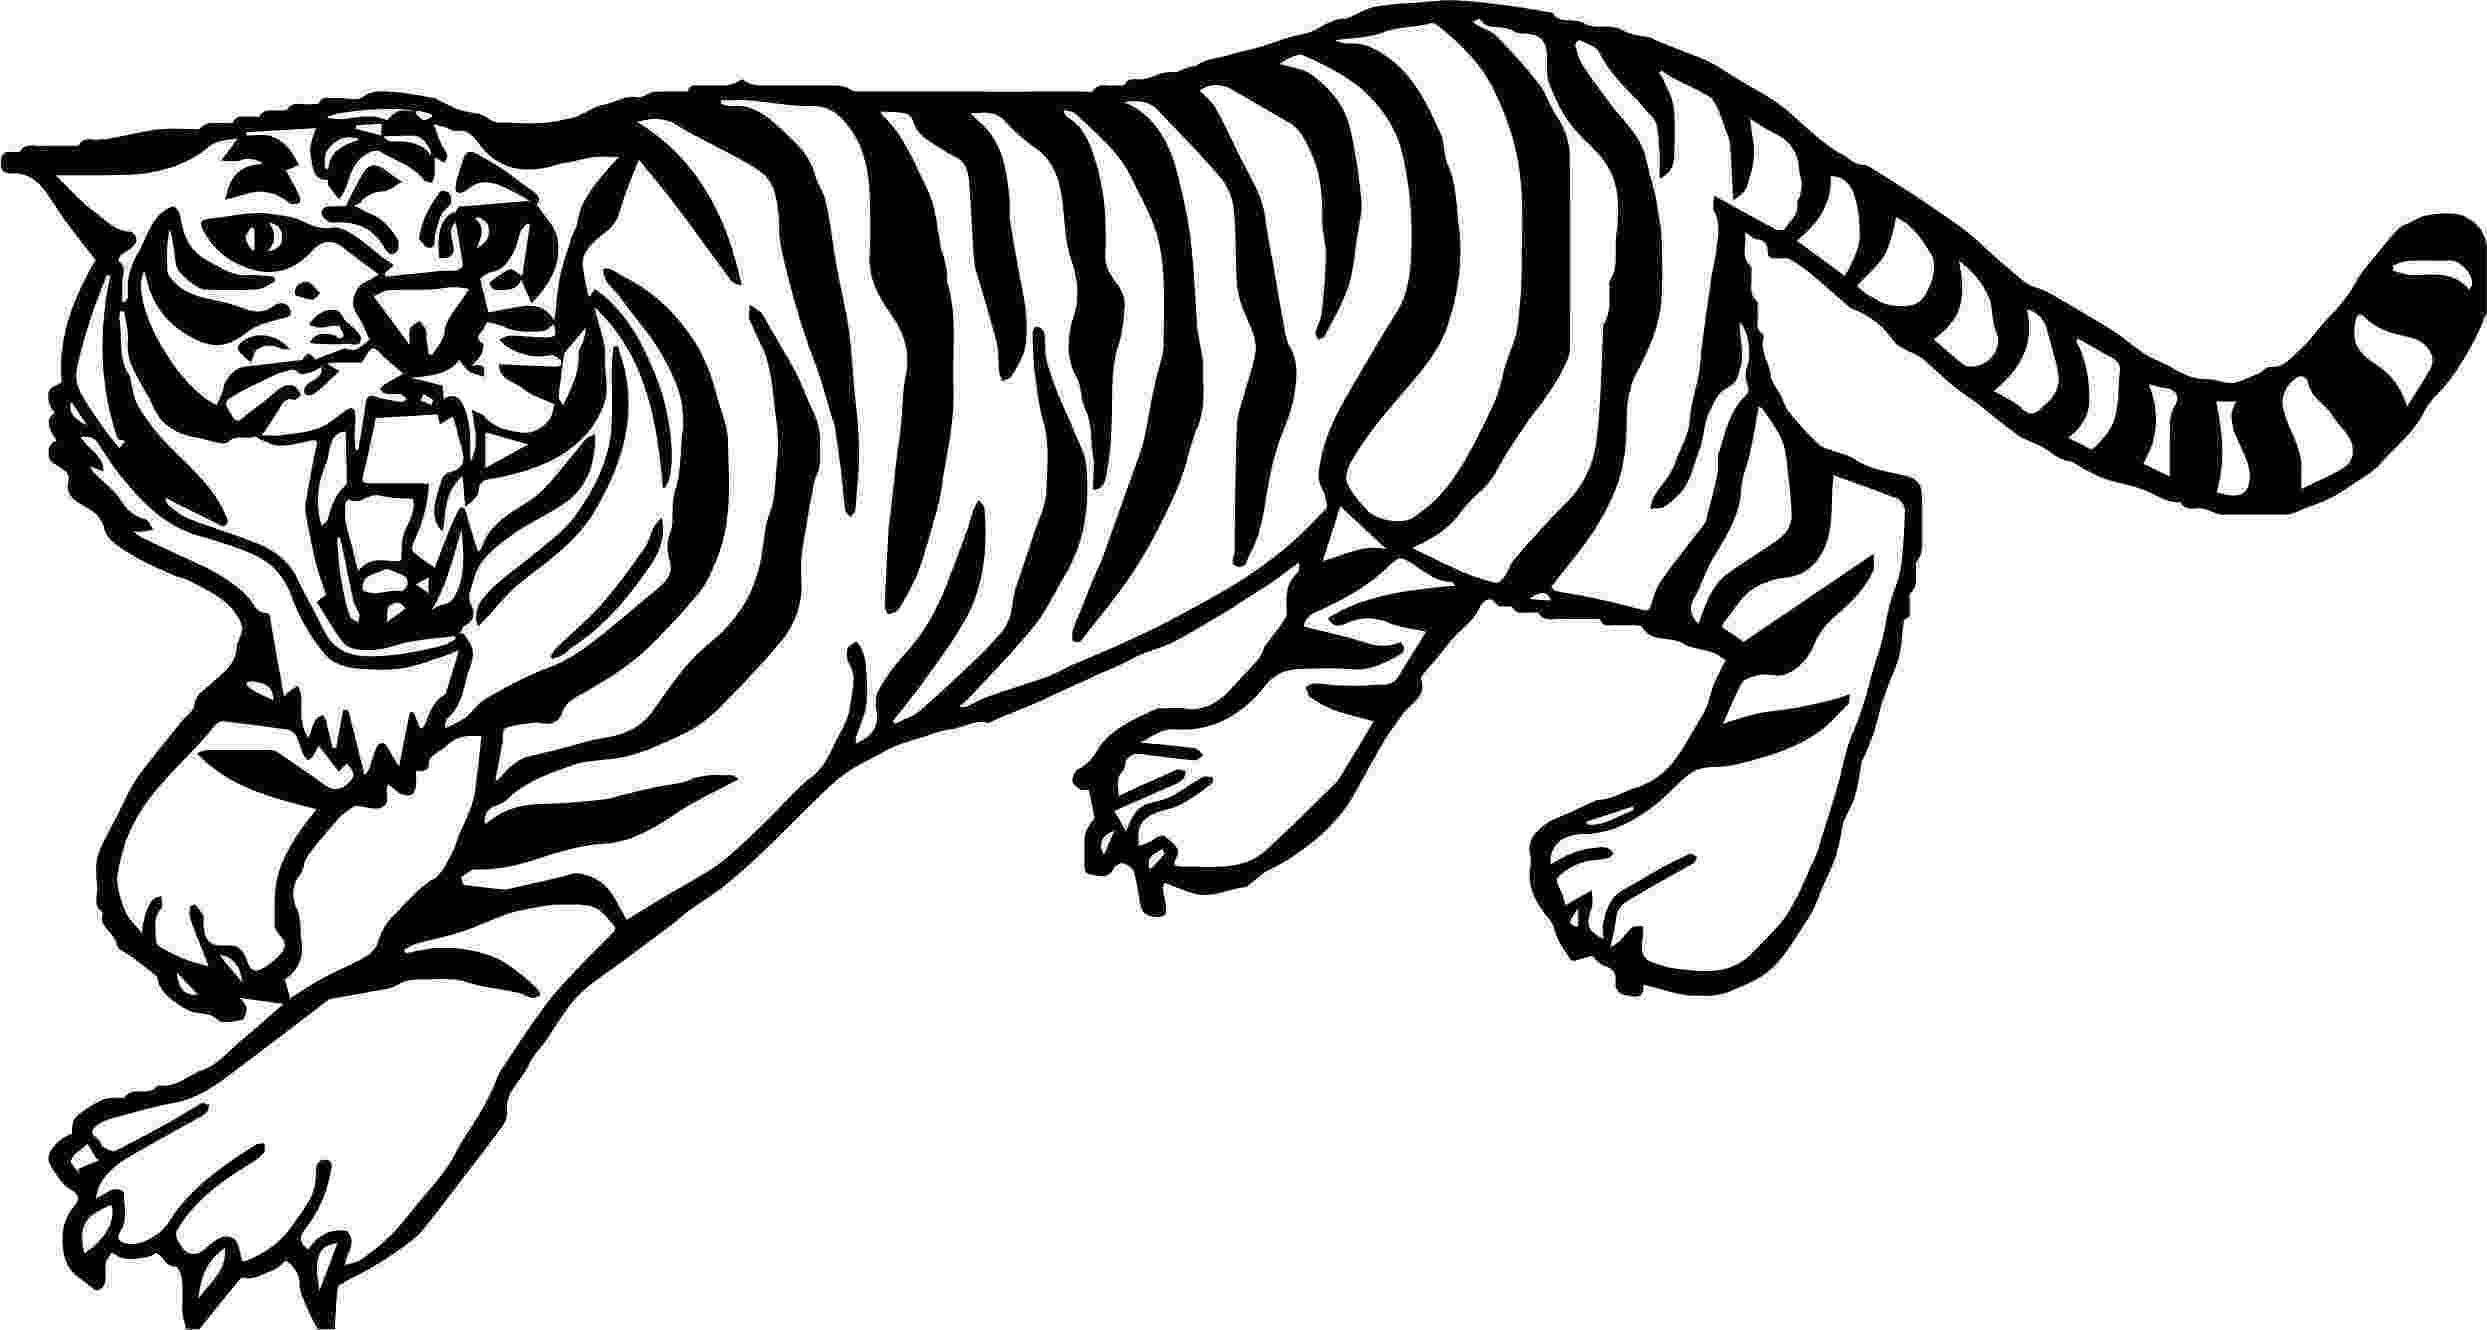 tiger to color kaplan kükreme boyama sayfası color to tiger